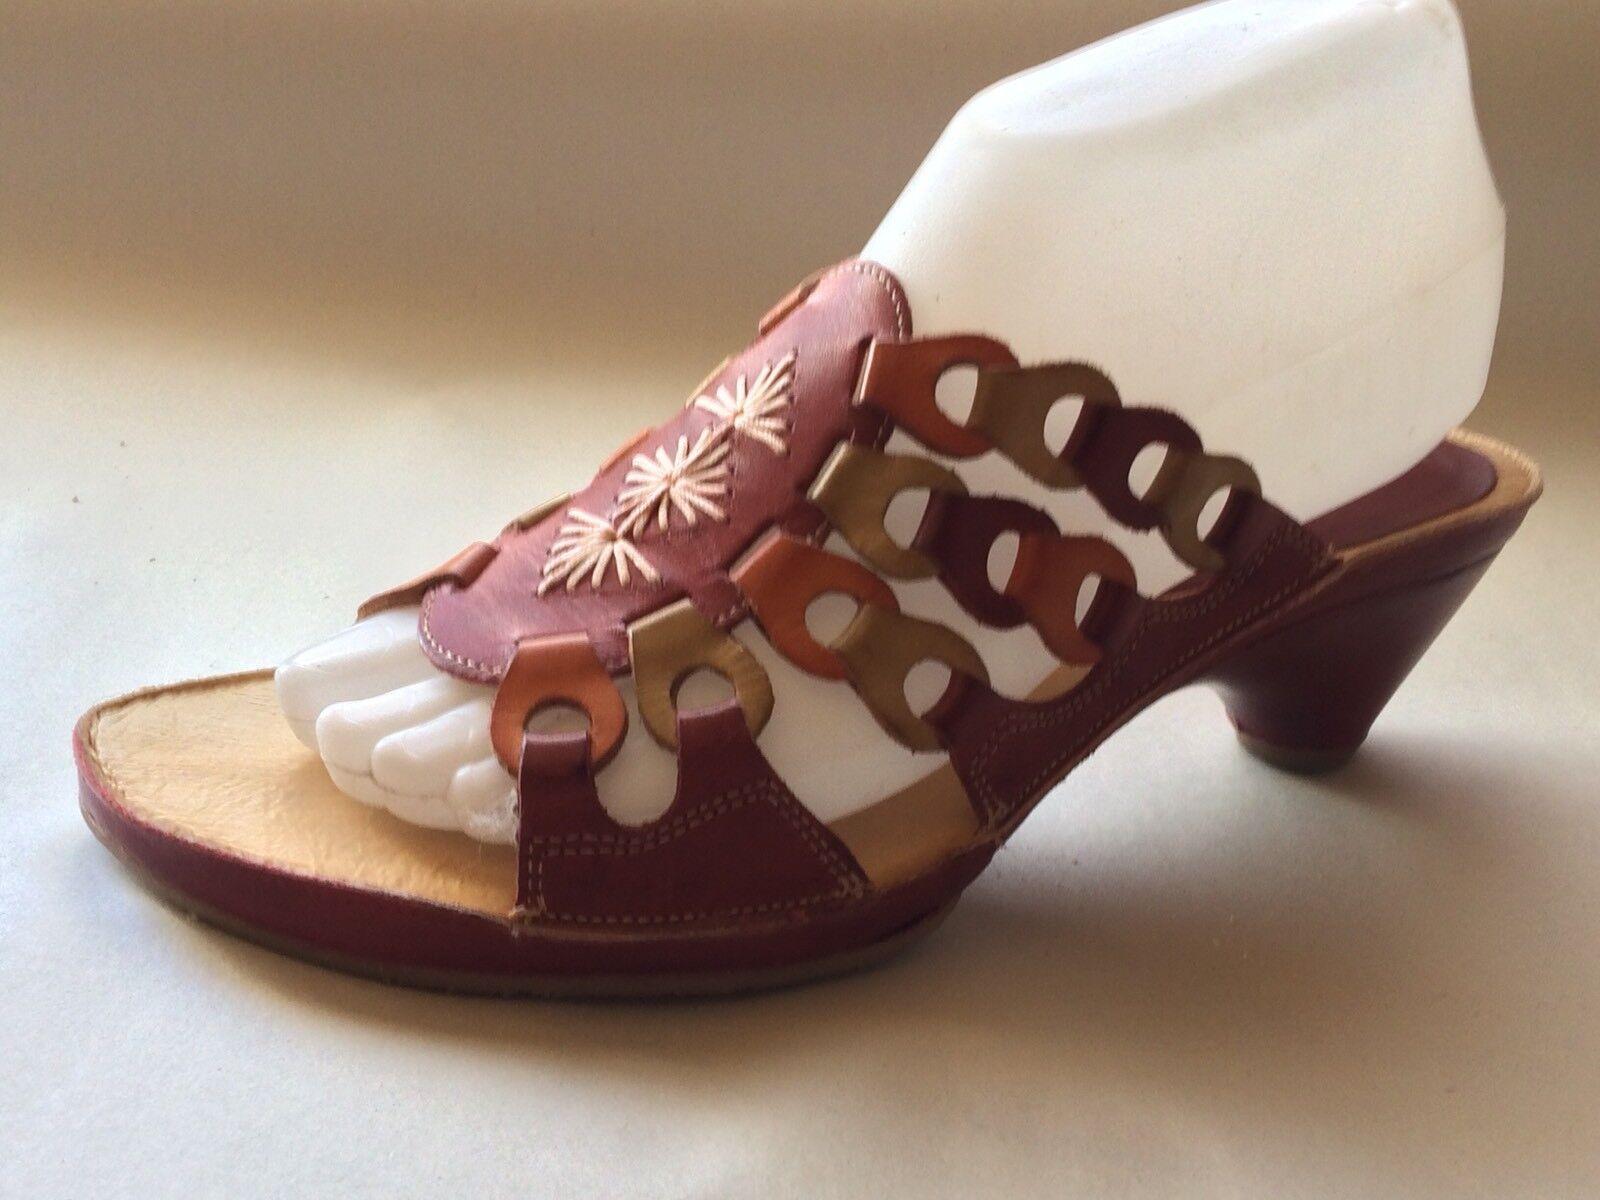 Pikolinos Womens 8 M EU 38 Red Tan orange Leather Slides High Heel Slides Sandal